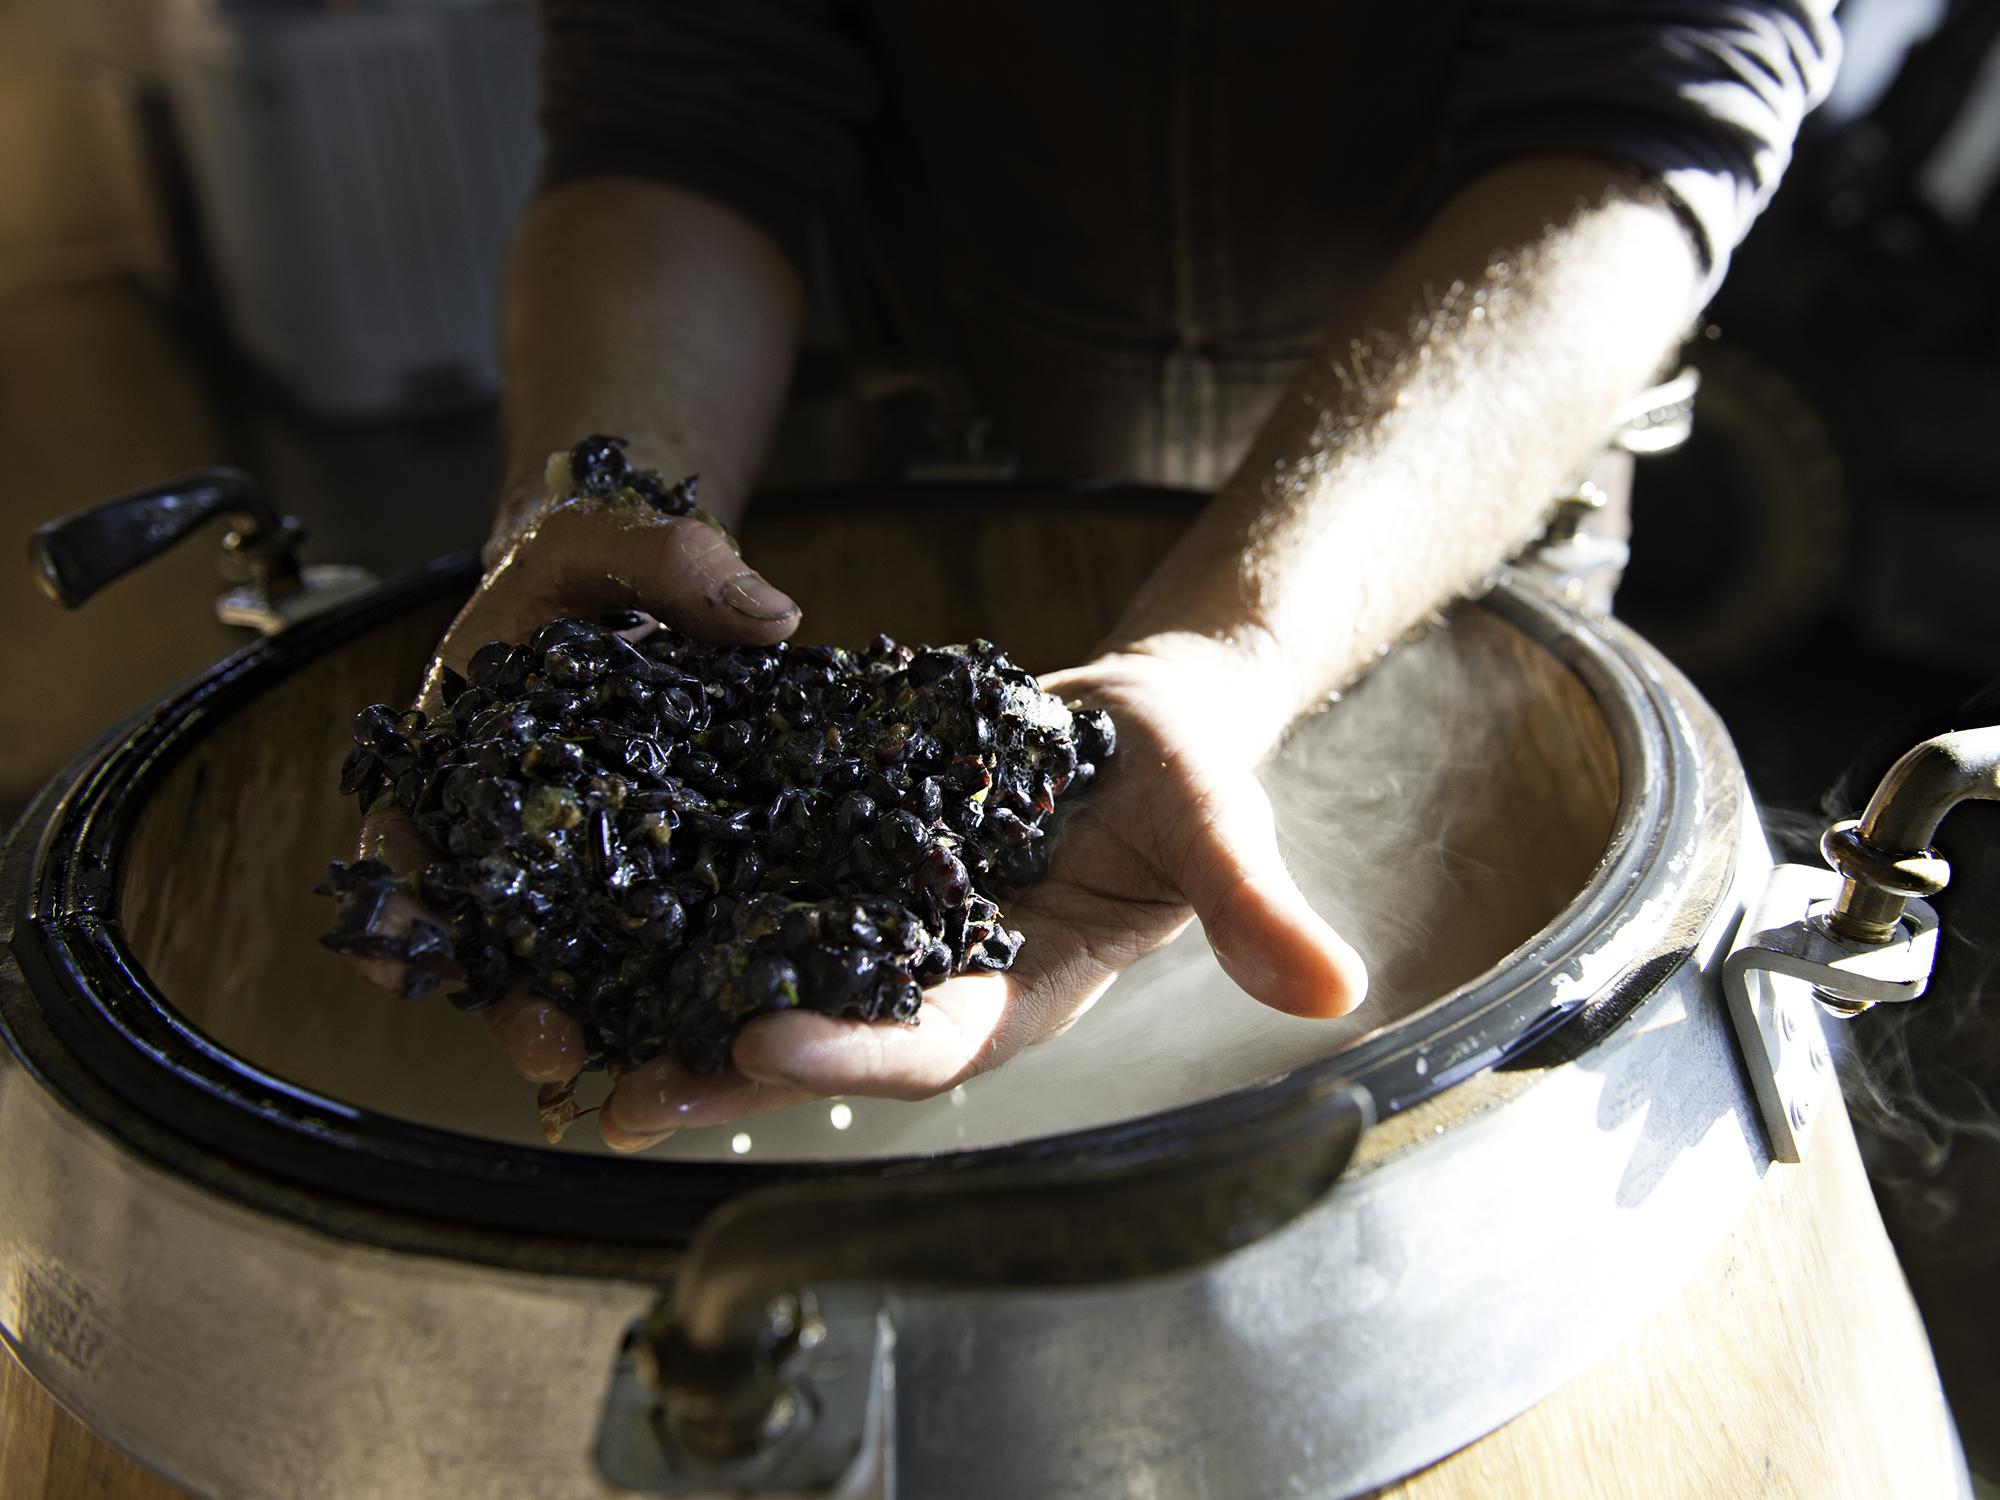 Van Duzer Vineyard & Winery